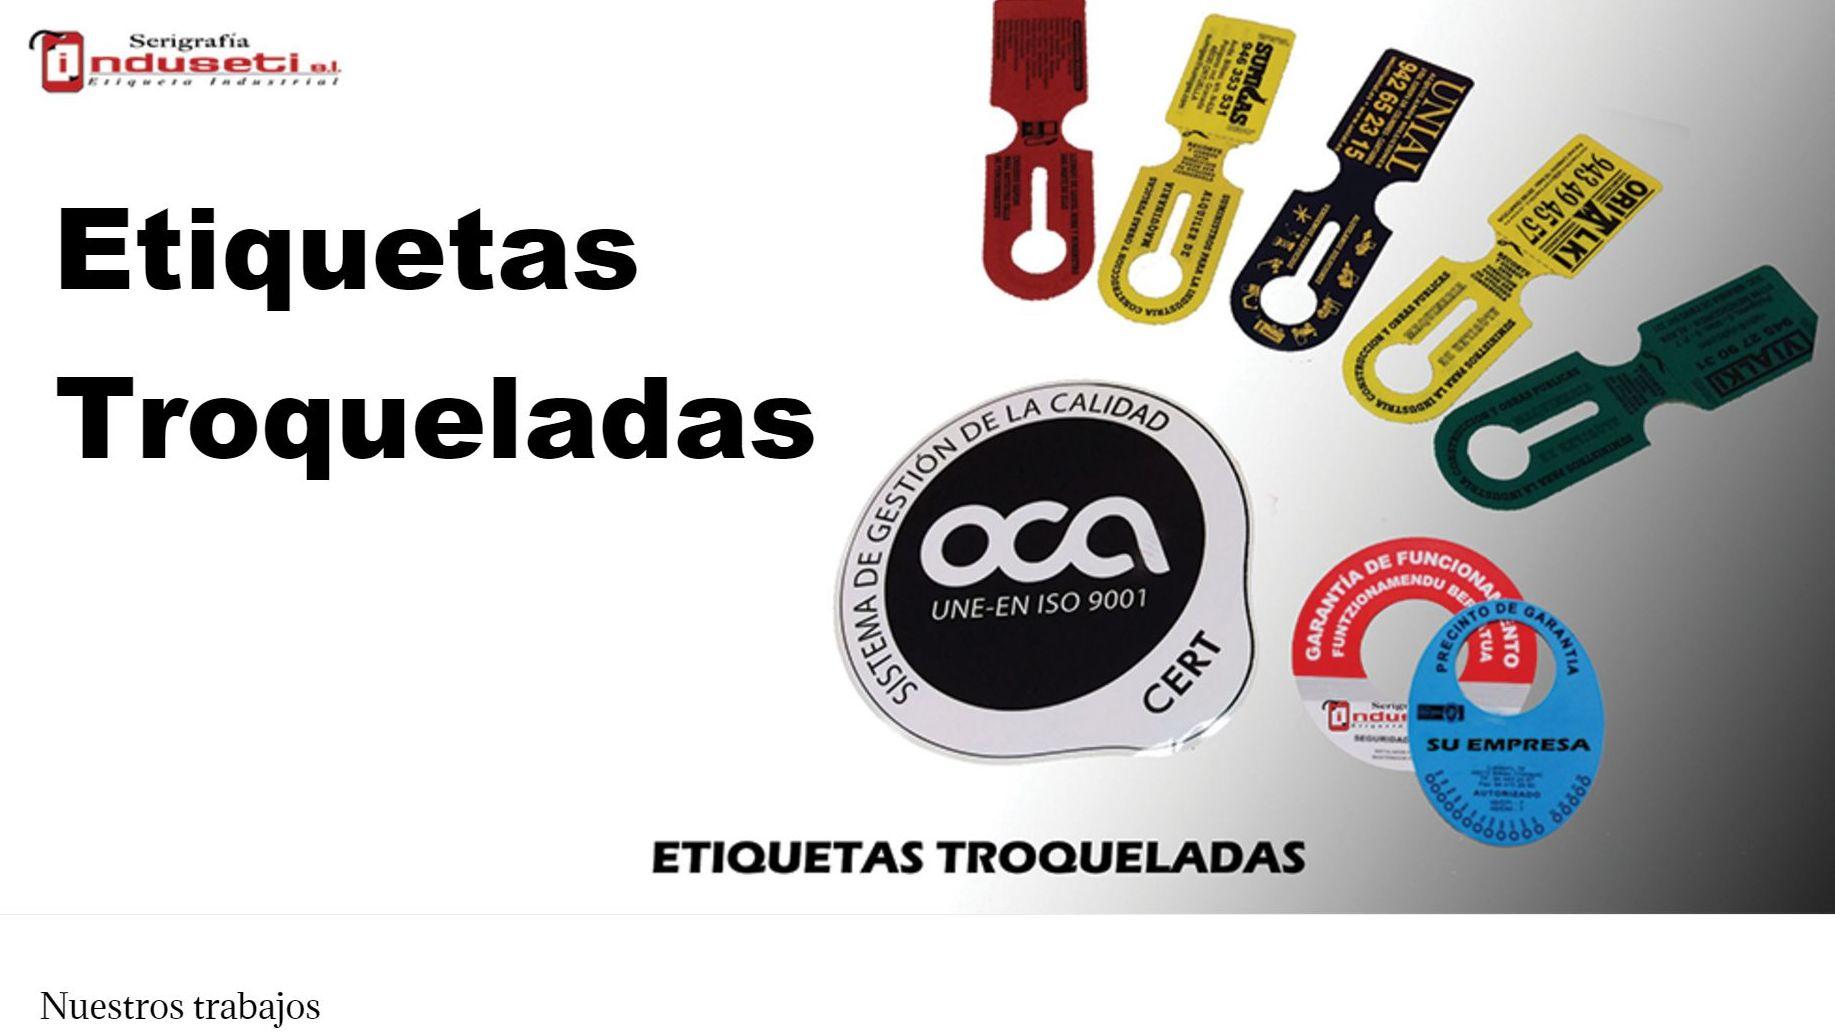 Etiquetas Troqueladas en Bilbao